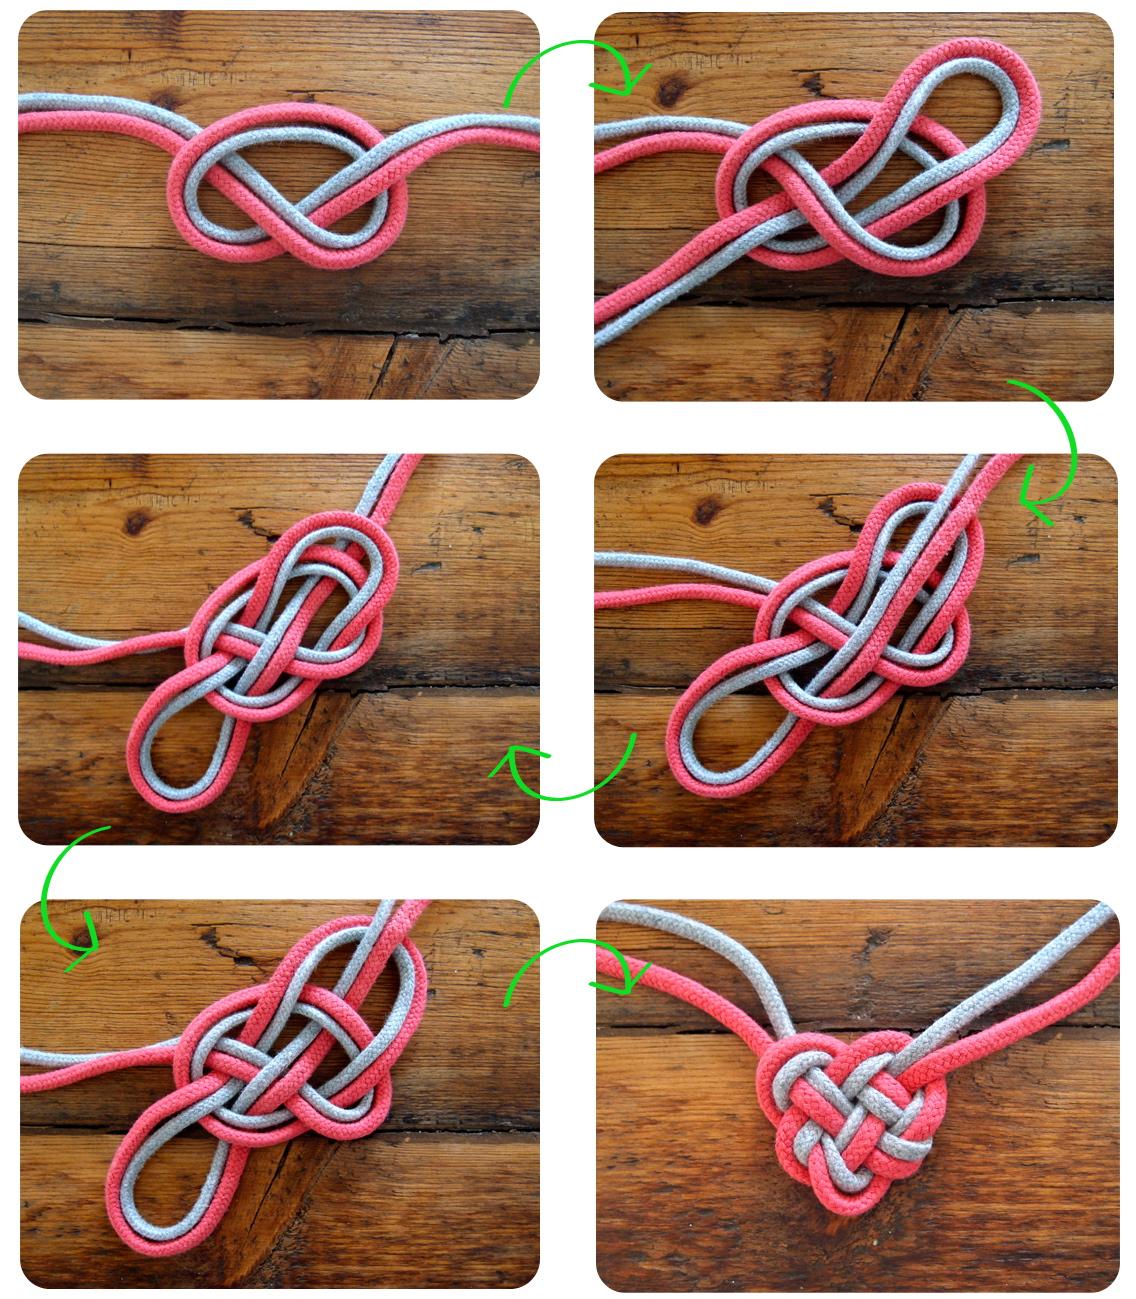 diy celtic heart knot necklace collier ficelle noeud en coeur clones 39 n 39 clowns. Black Bedroom Furniture Sets. Home Design Ideas